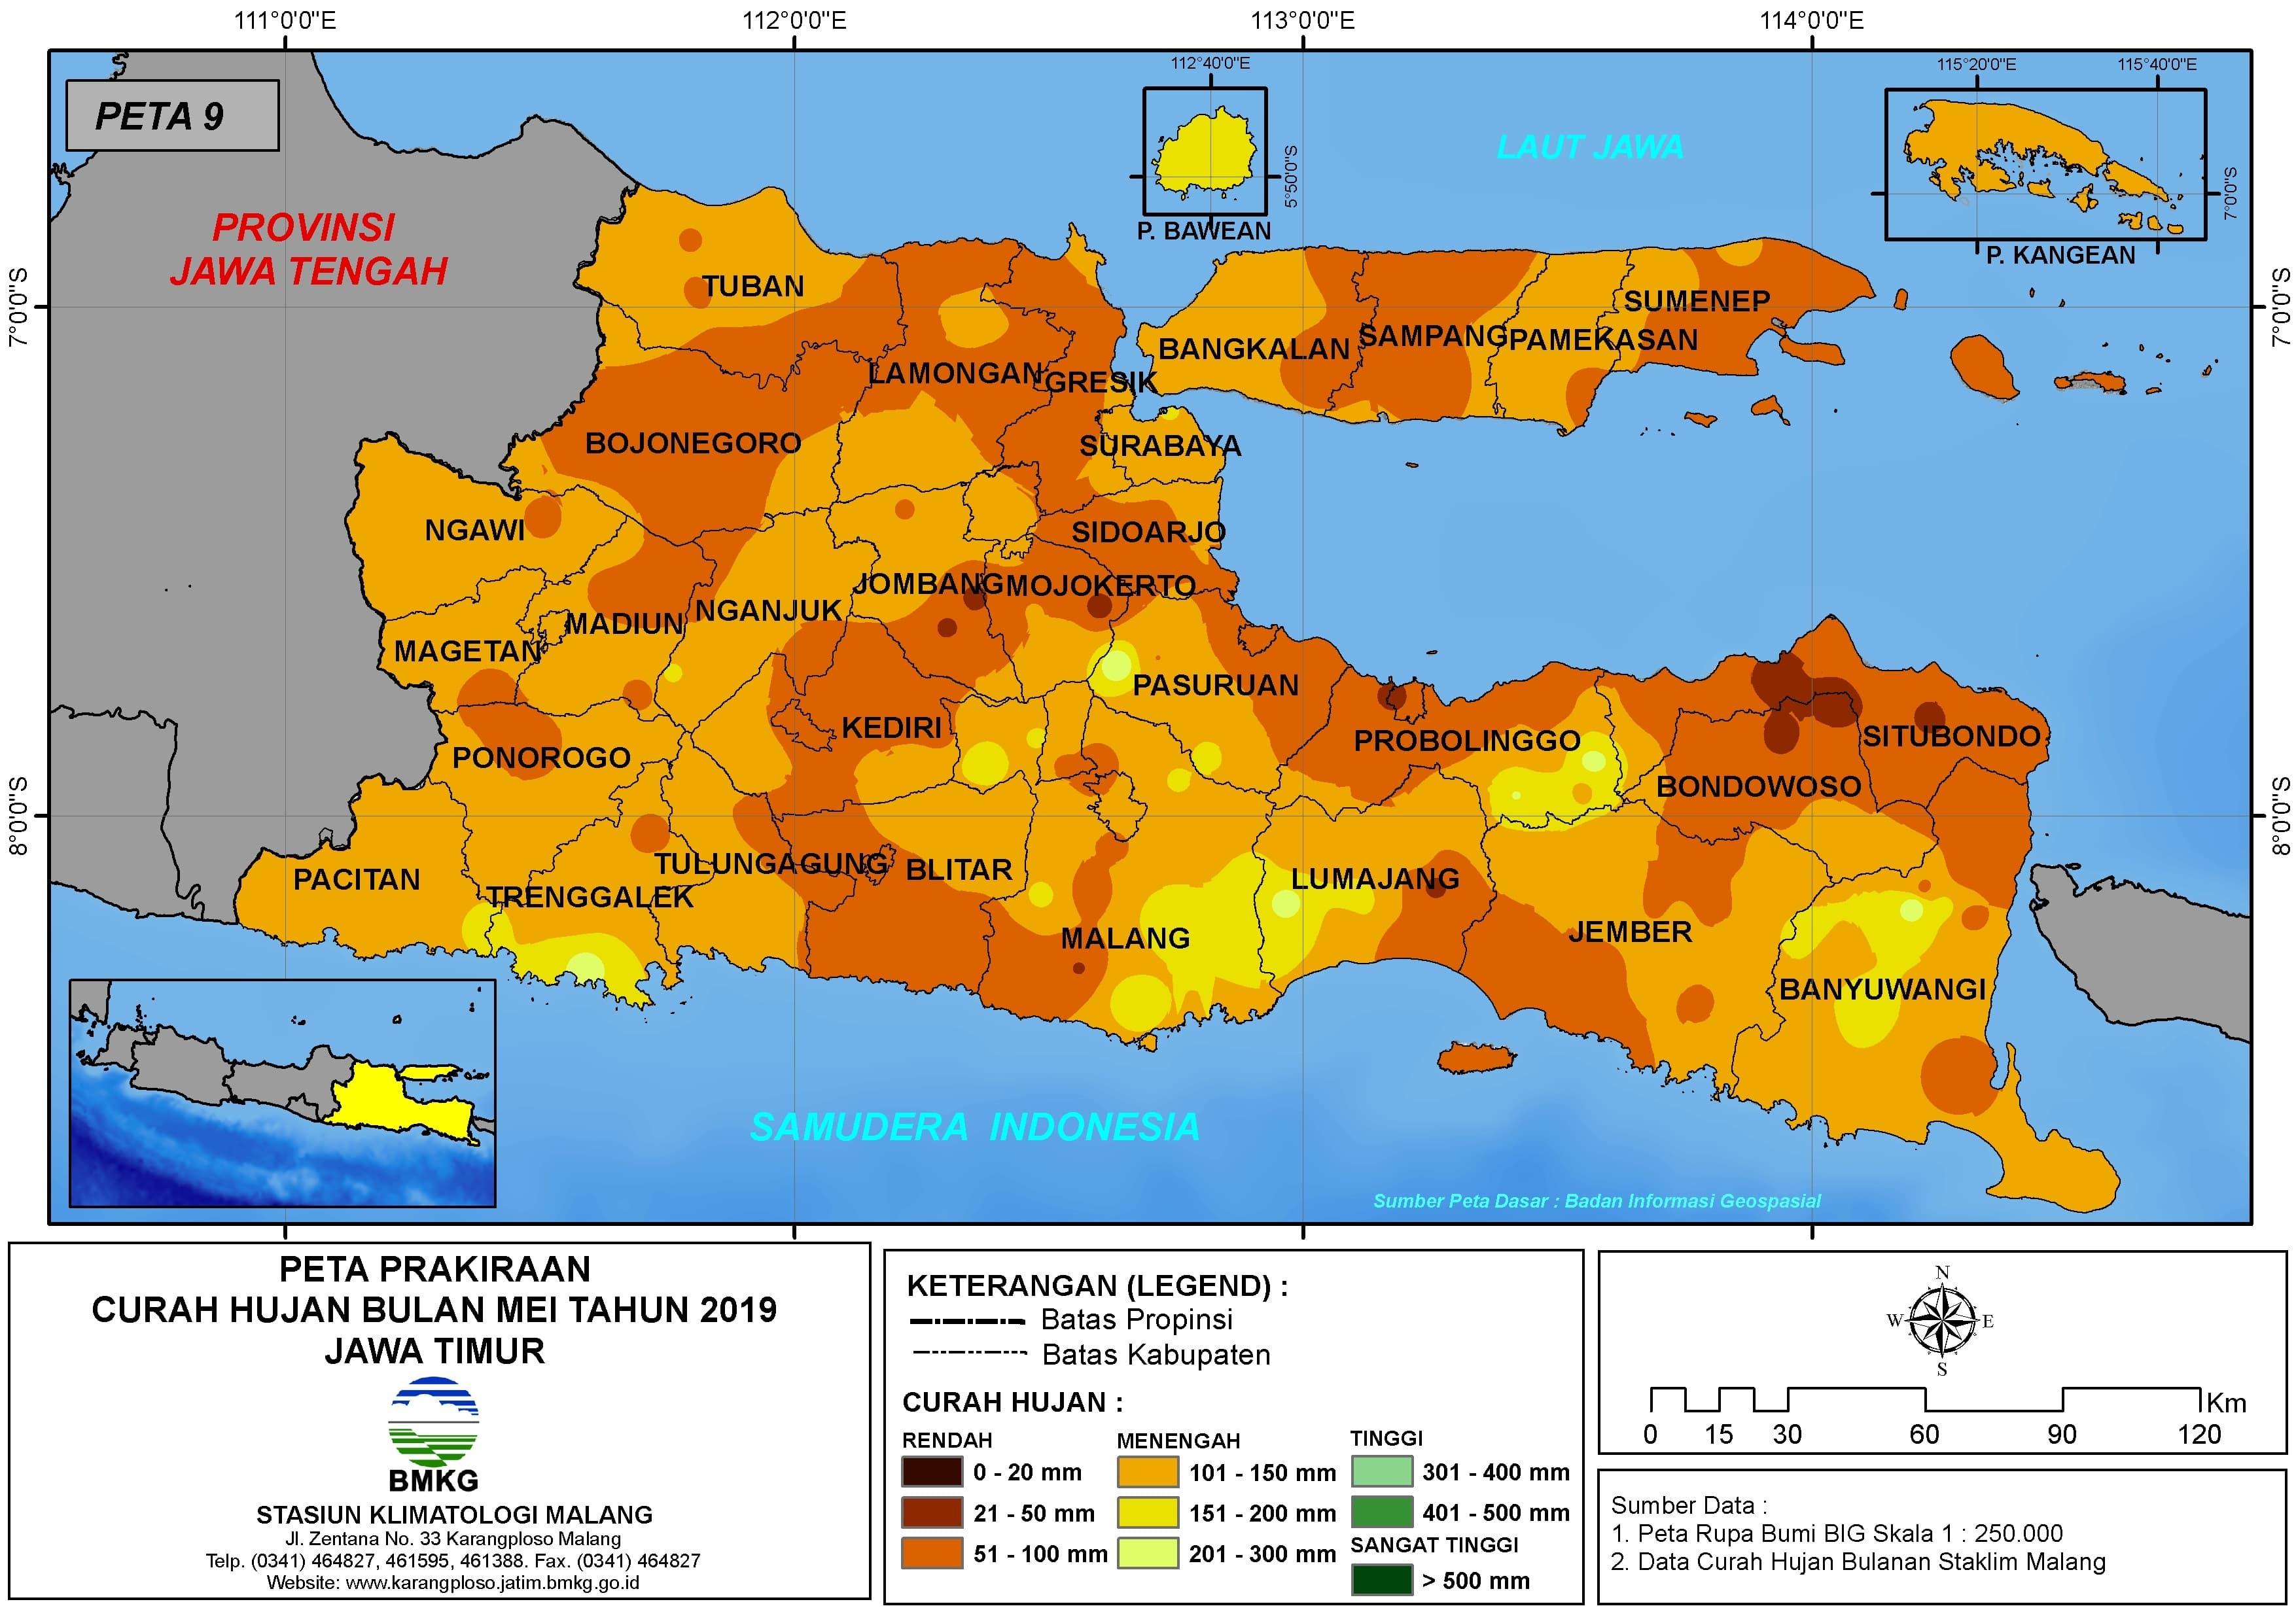 Prakiraan Curah Hujan Bulan Mei Tahun 2019 di Provinsi Jawa Timur Update dari Analisis Bulan Januari 2019